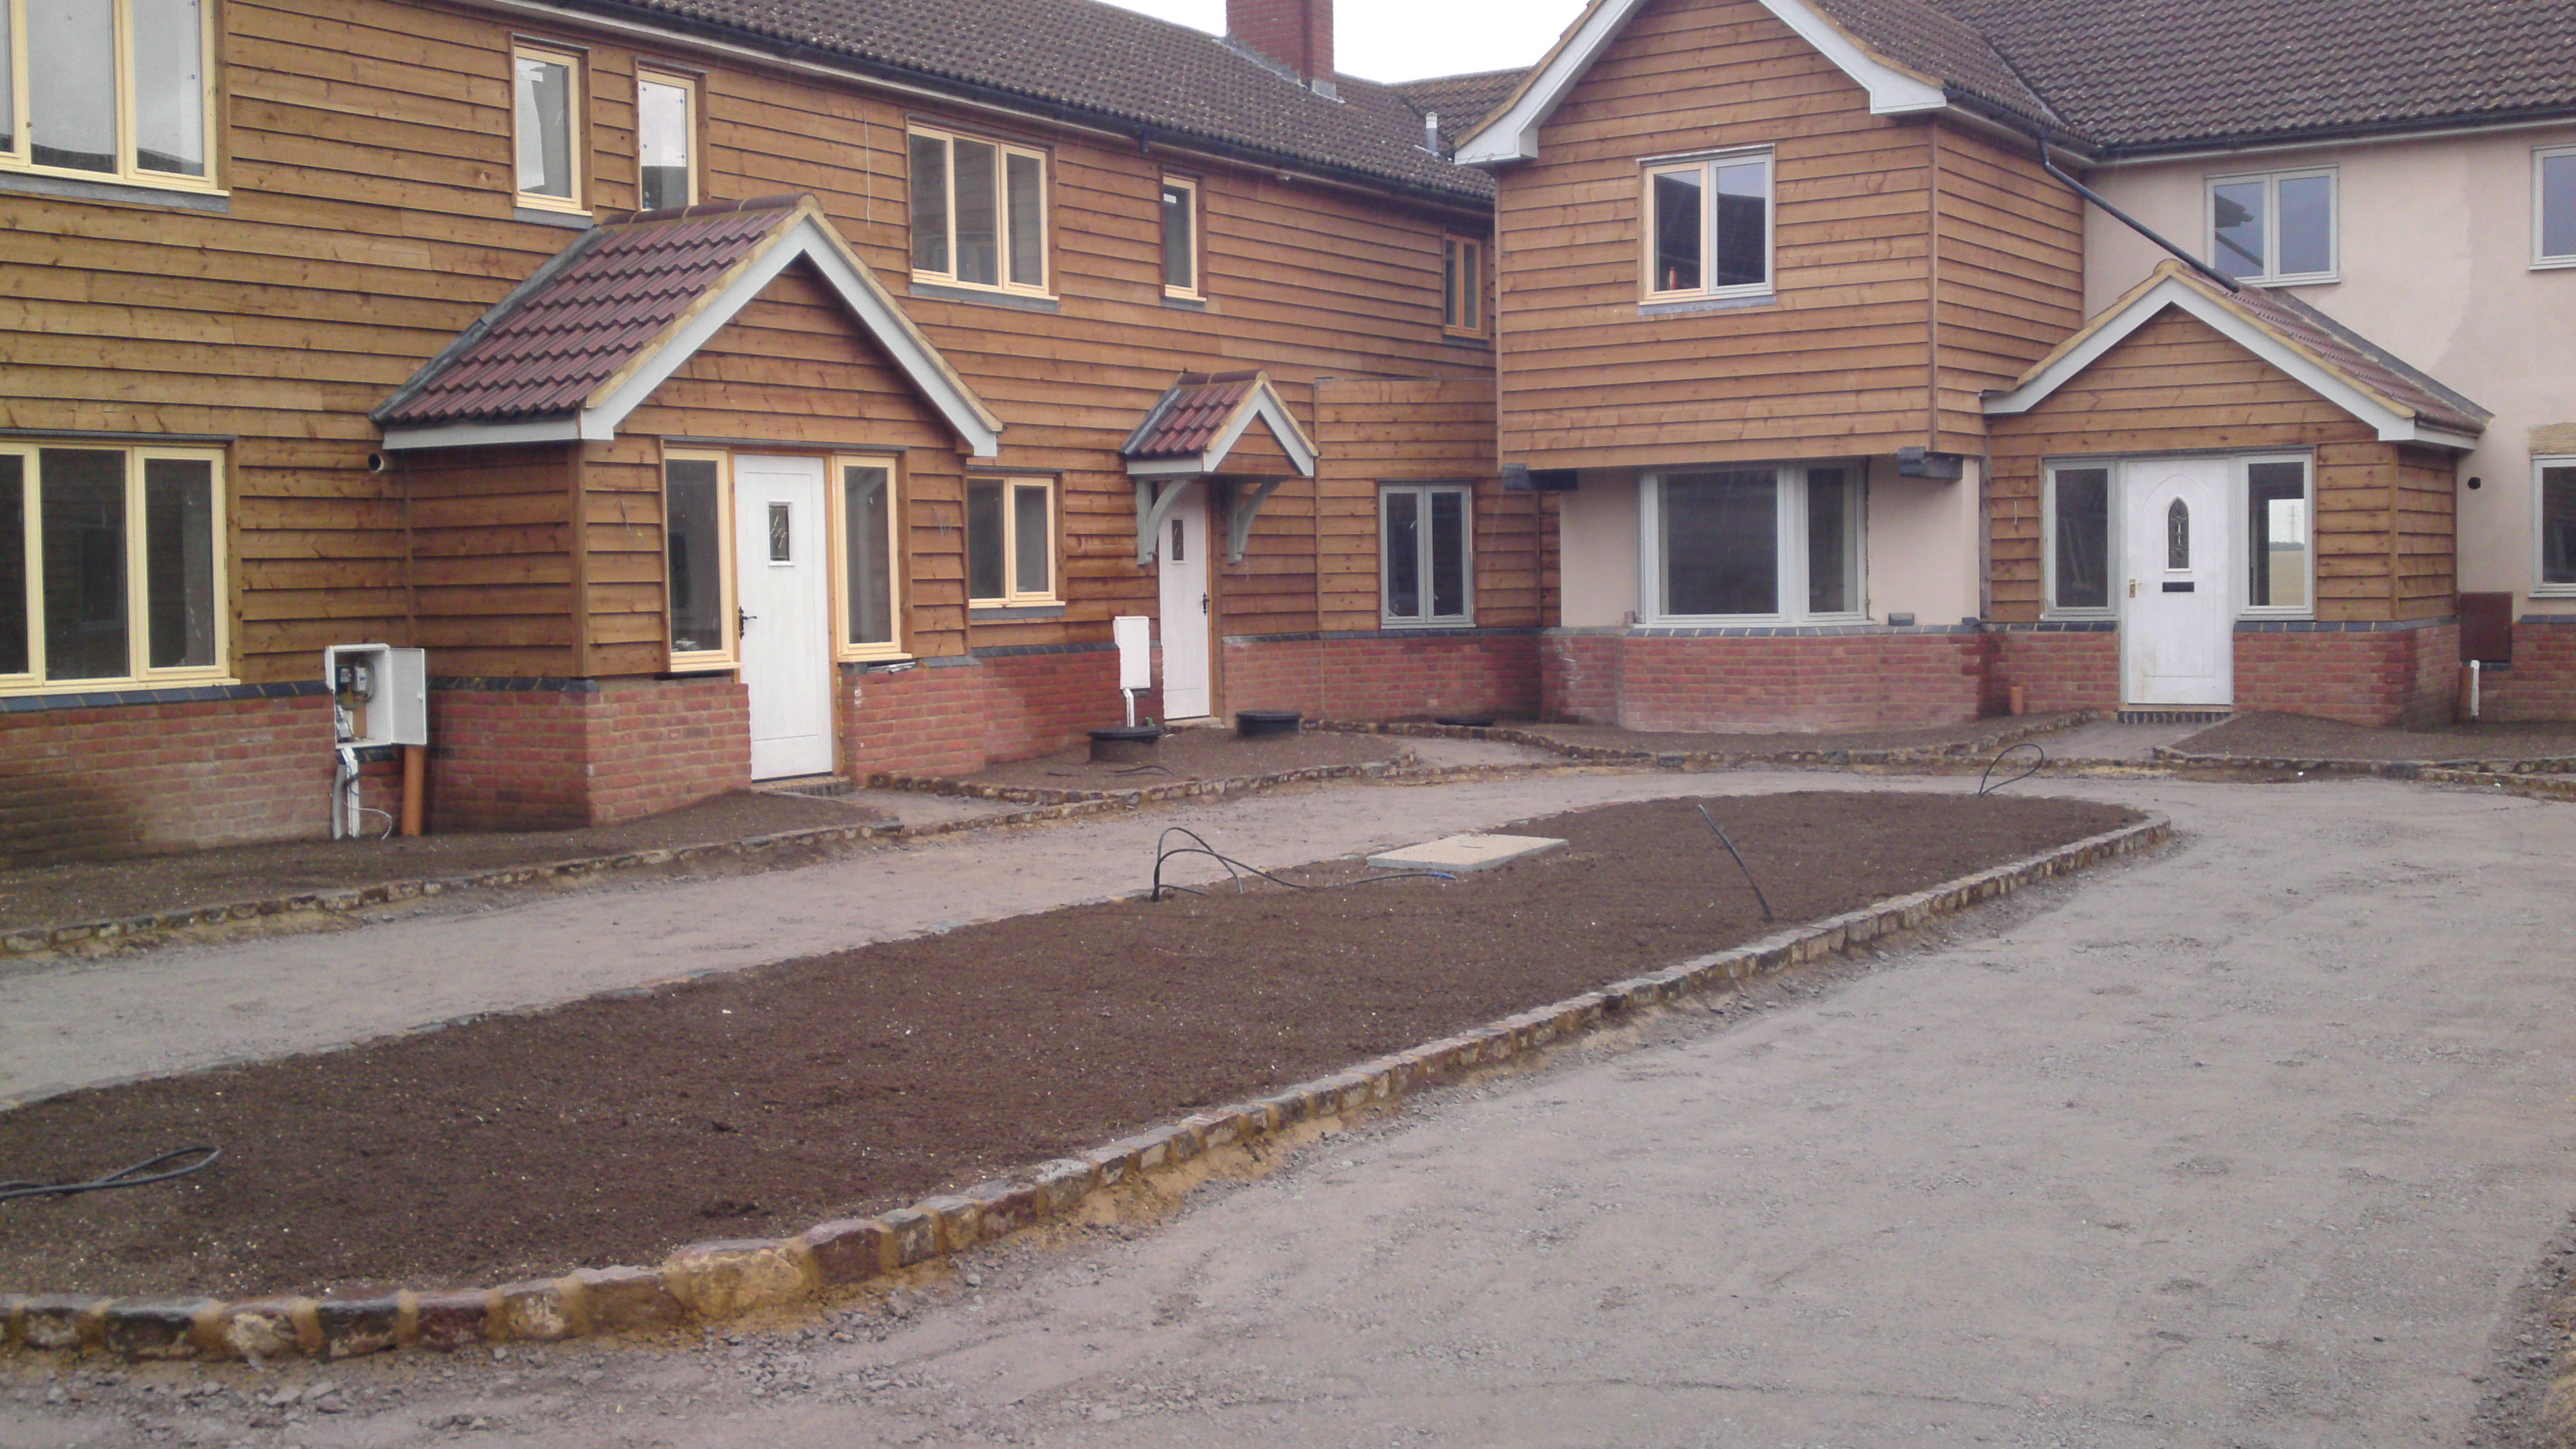 Same scheme pre- landscaping